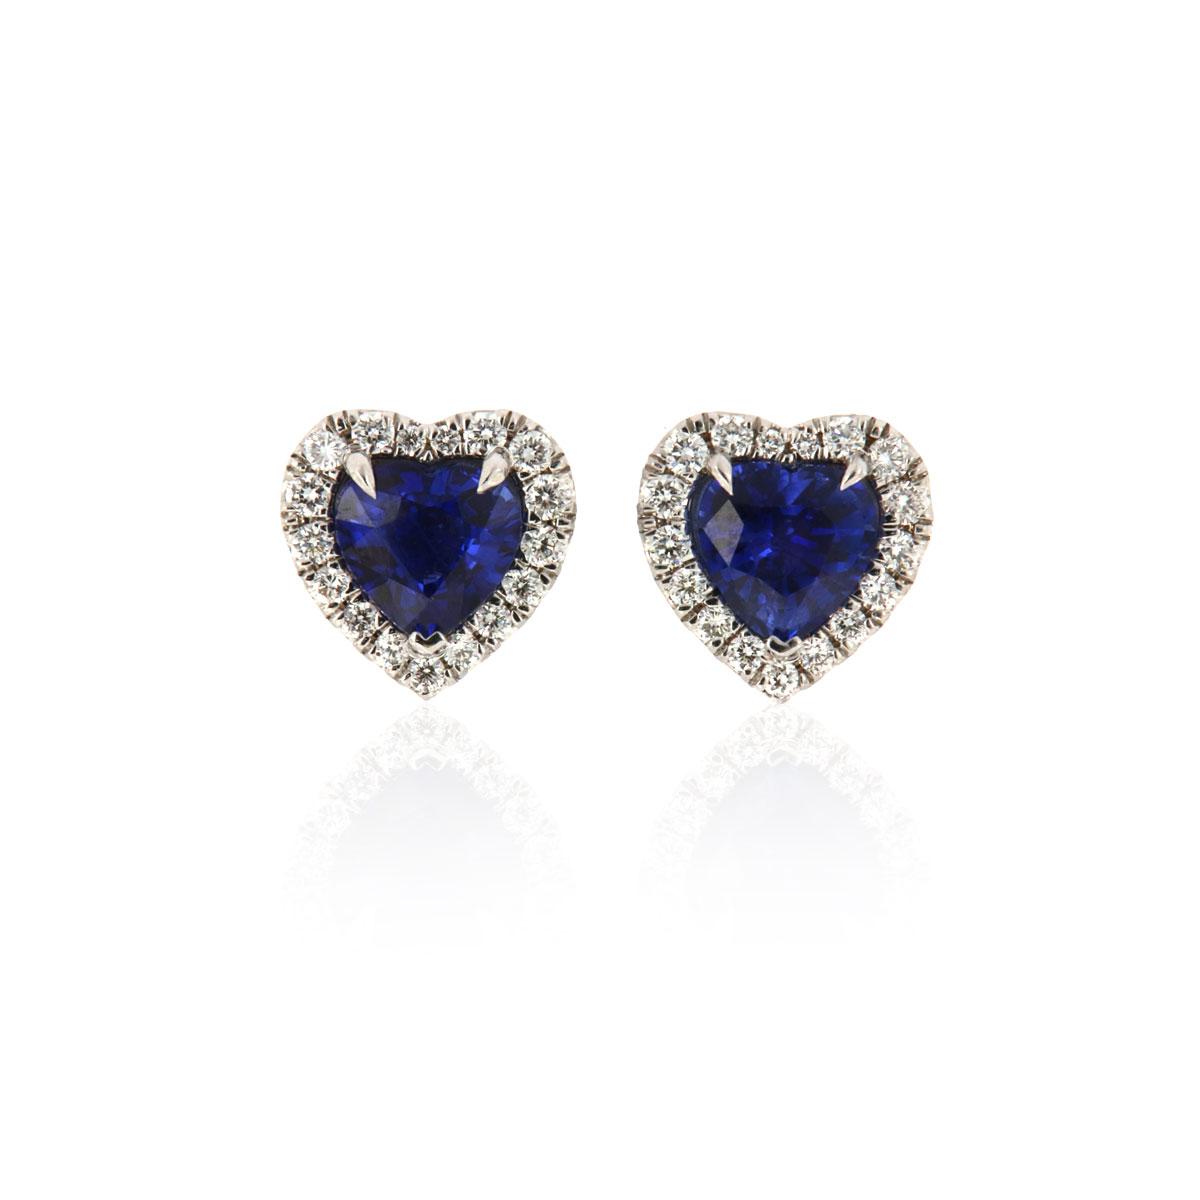 18k White gold Heart Shape Blue Sapphires & Diamonds Halo Earrings ( 3 3/4 ct. tw)